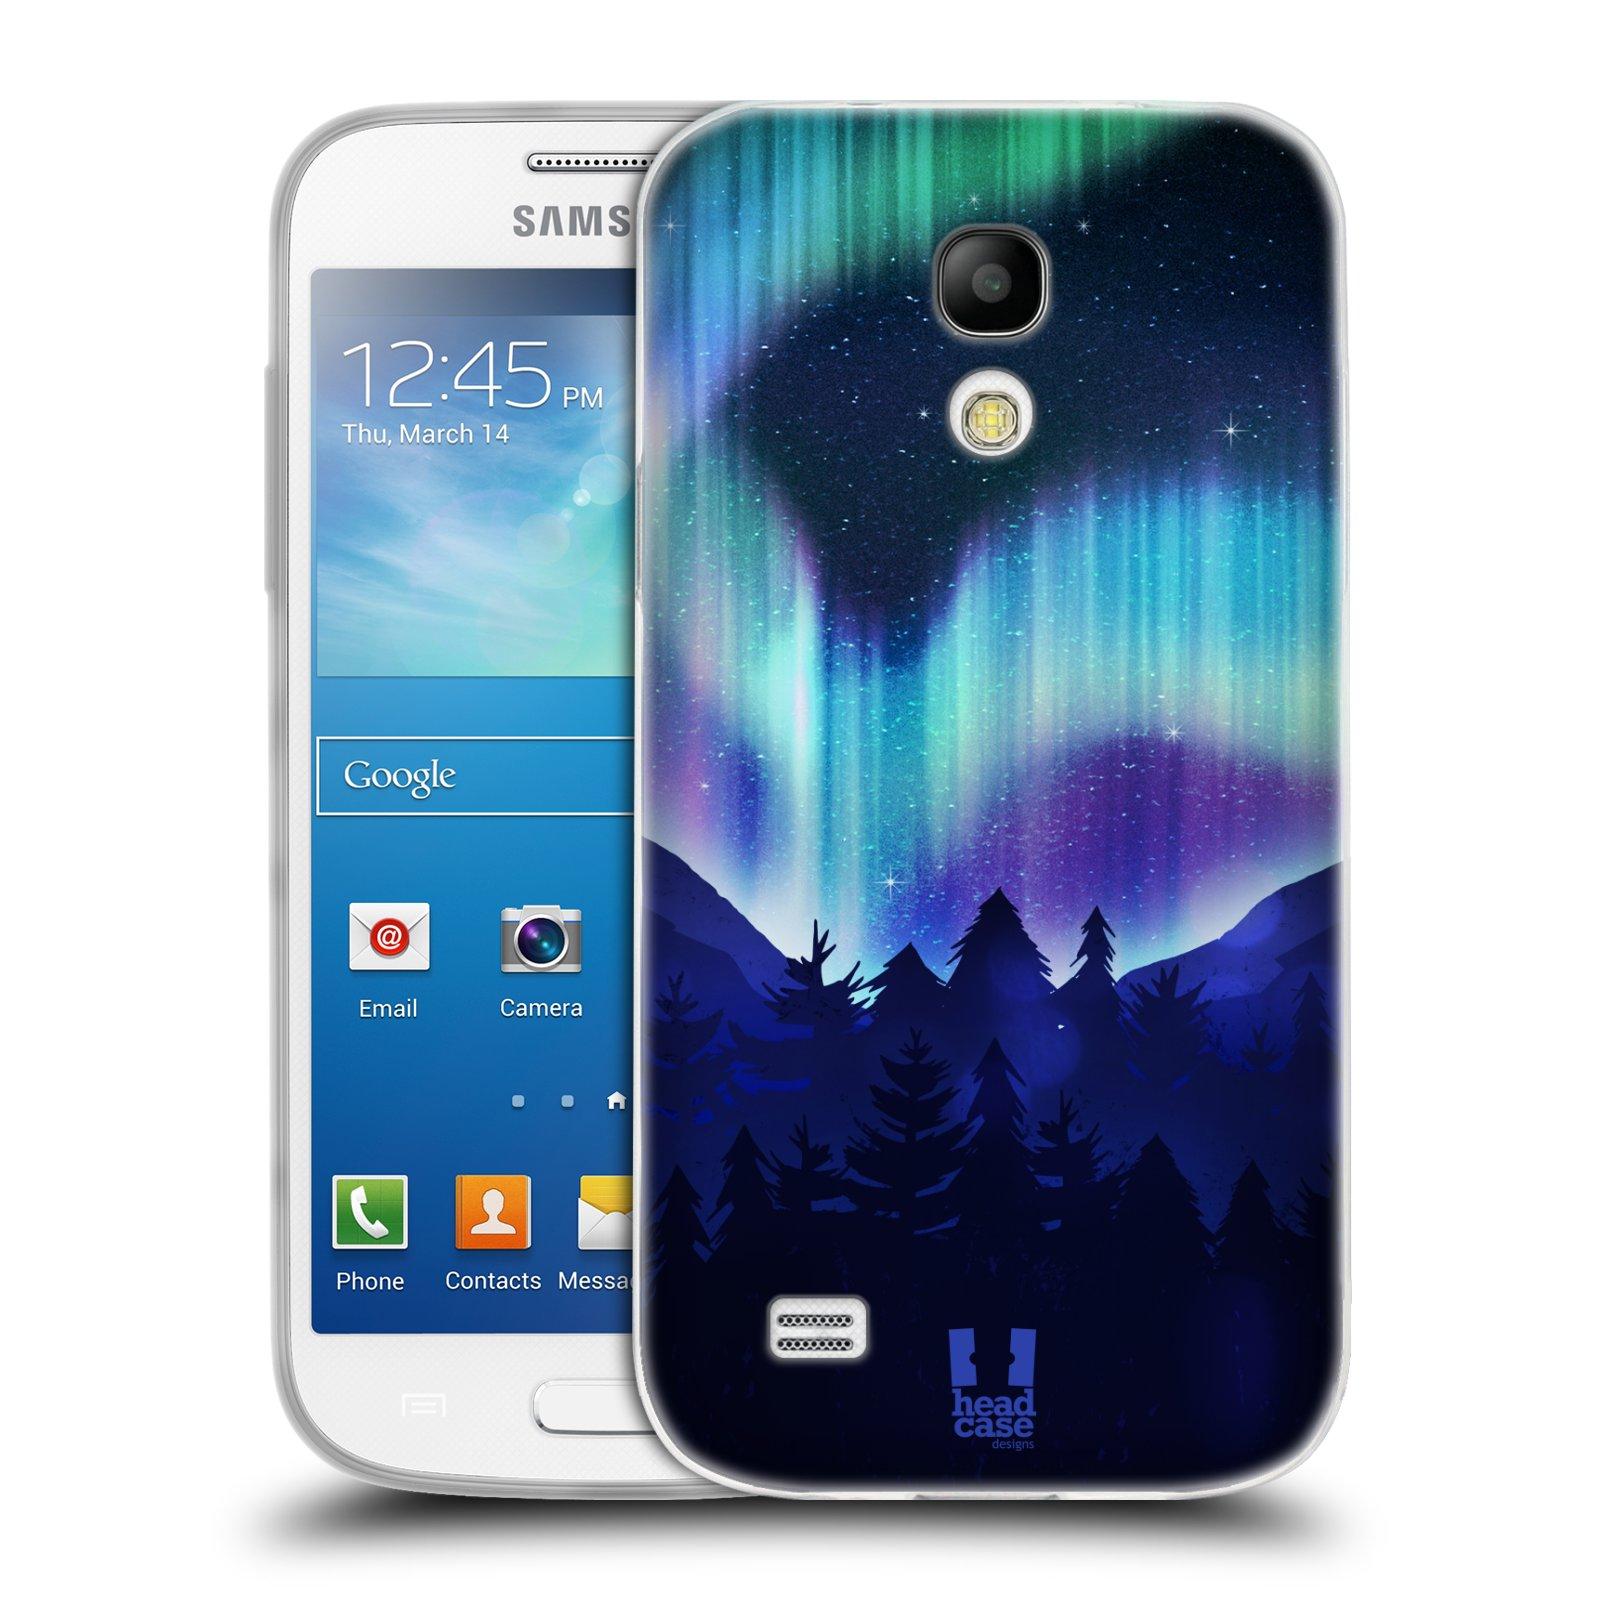 Silikonové pouzdro na mobil Samsung Galaxy S4 Mini HEAD CASE Polární Záře Borovice (Silikonový kryt či obal na mobilní telefon Samsung Galaxy S4 Mini GT-i9195 / i9190)